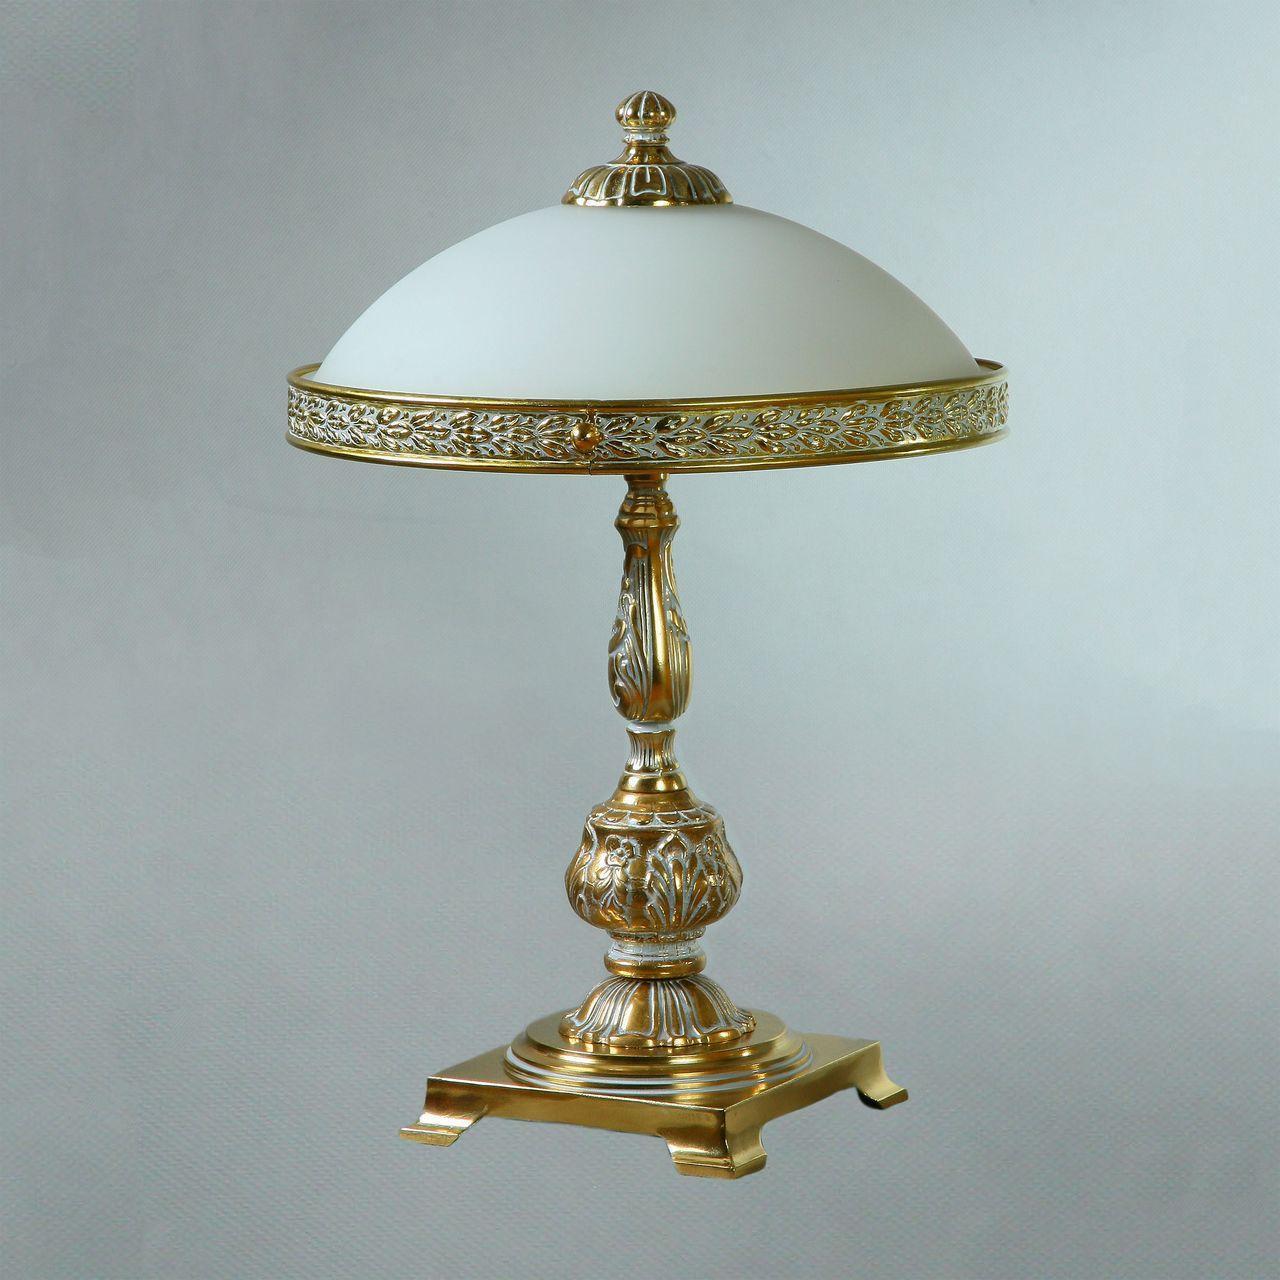 Настольная лампа Ambiente Toledo 02155T/3 WP ambiente cветильник на штанге ambiente navarra 02228 35 pl wp